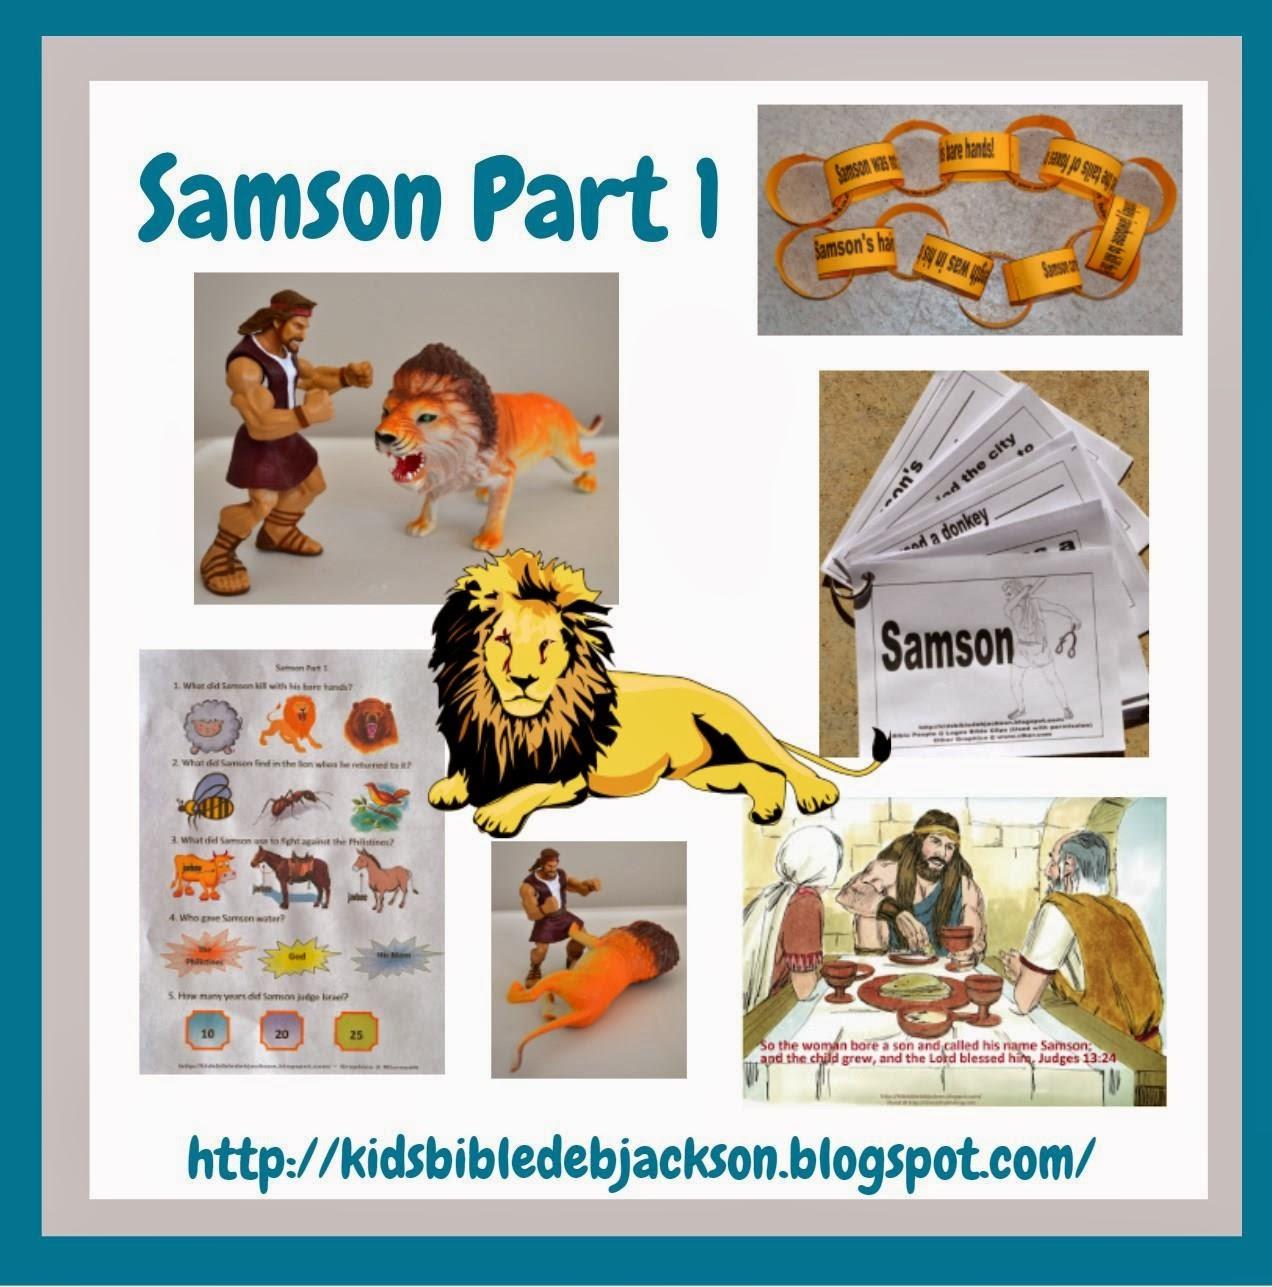 http://kidsbibledebjackson.blogspot.com/2014/01/samson-part-1.html